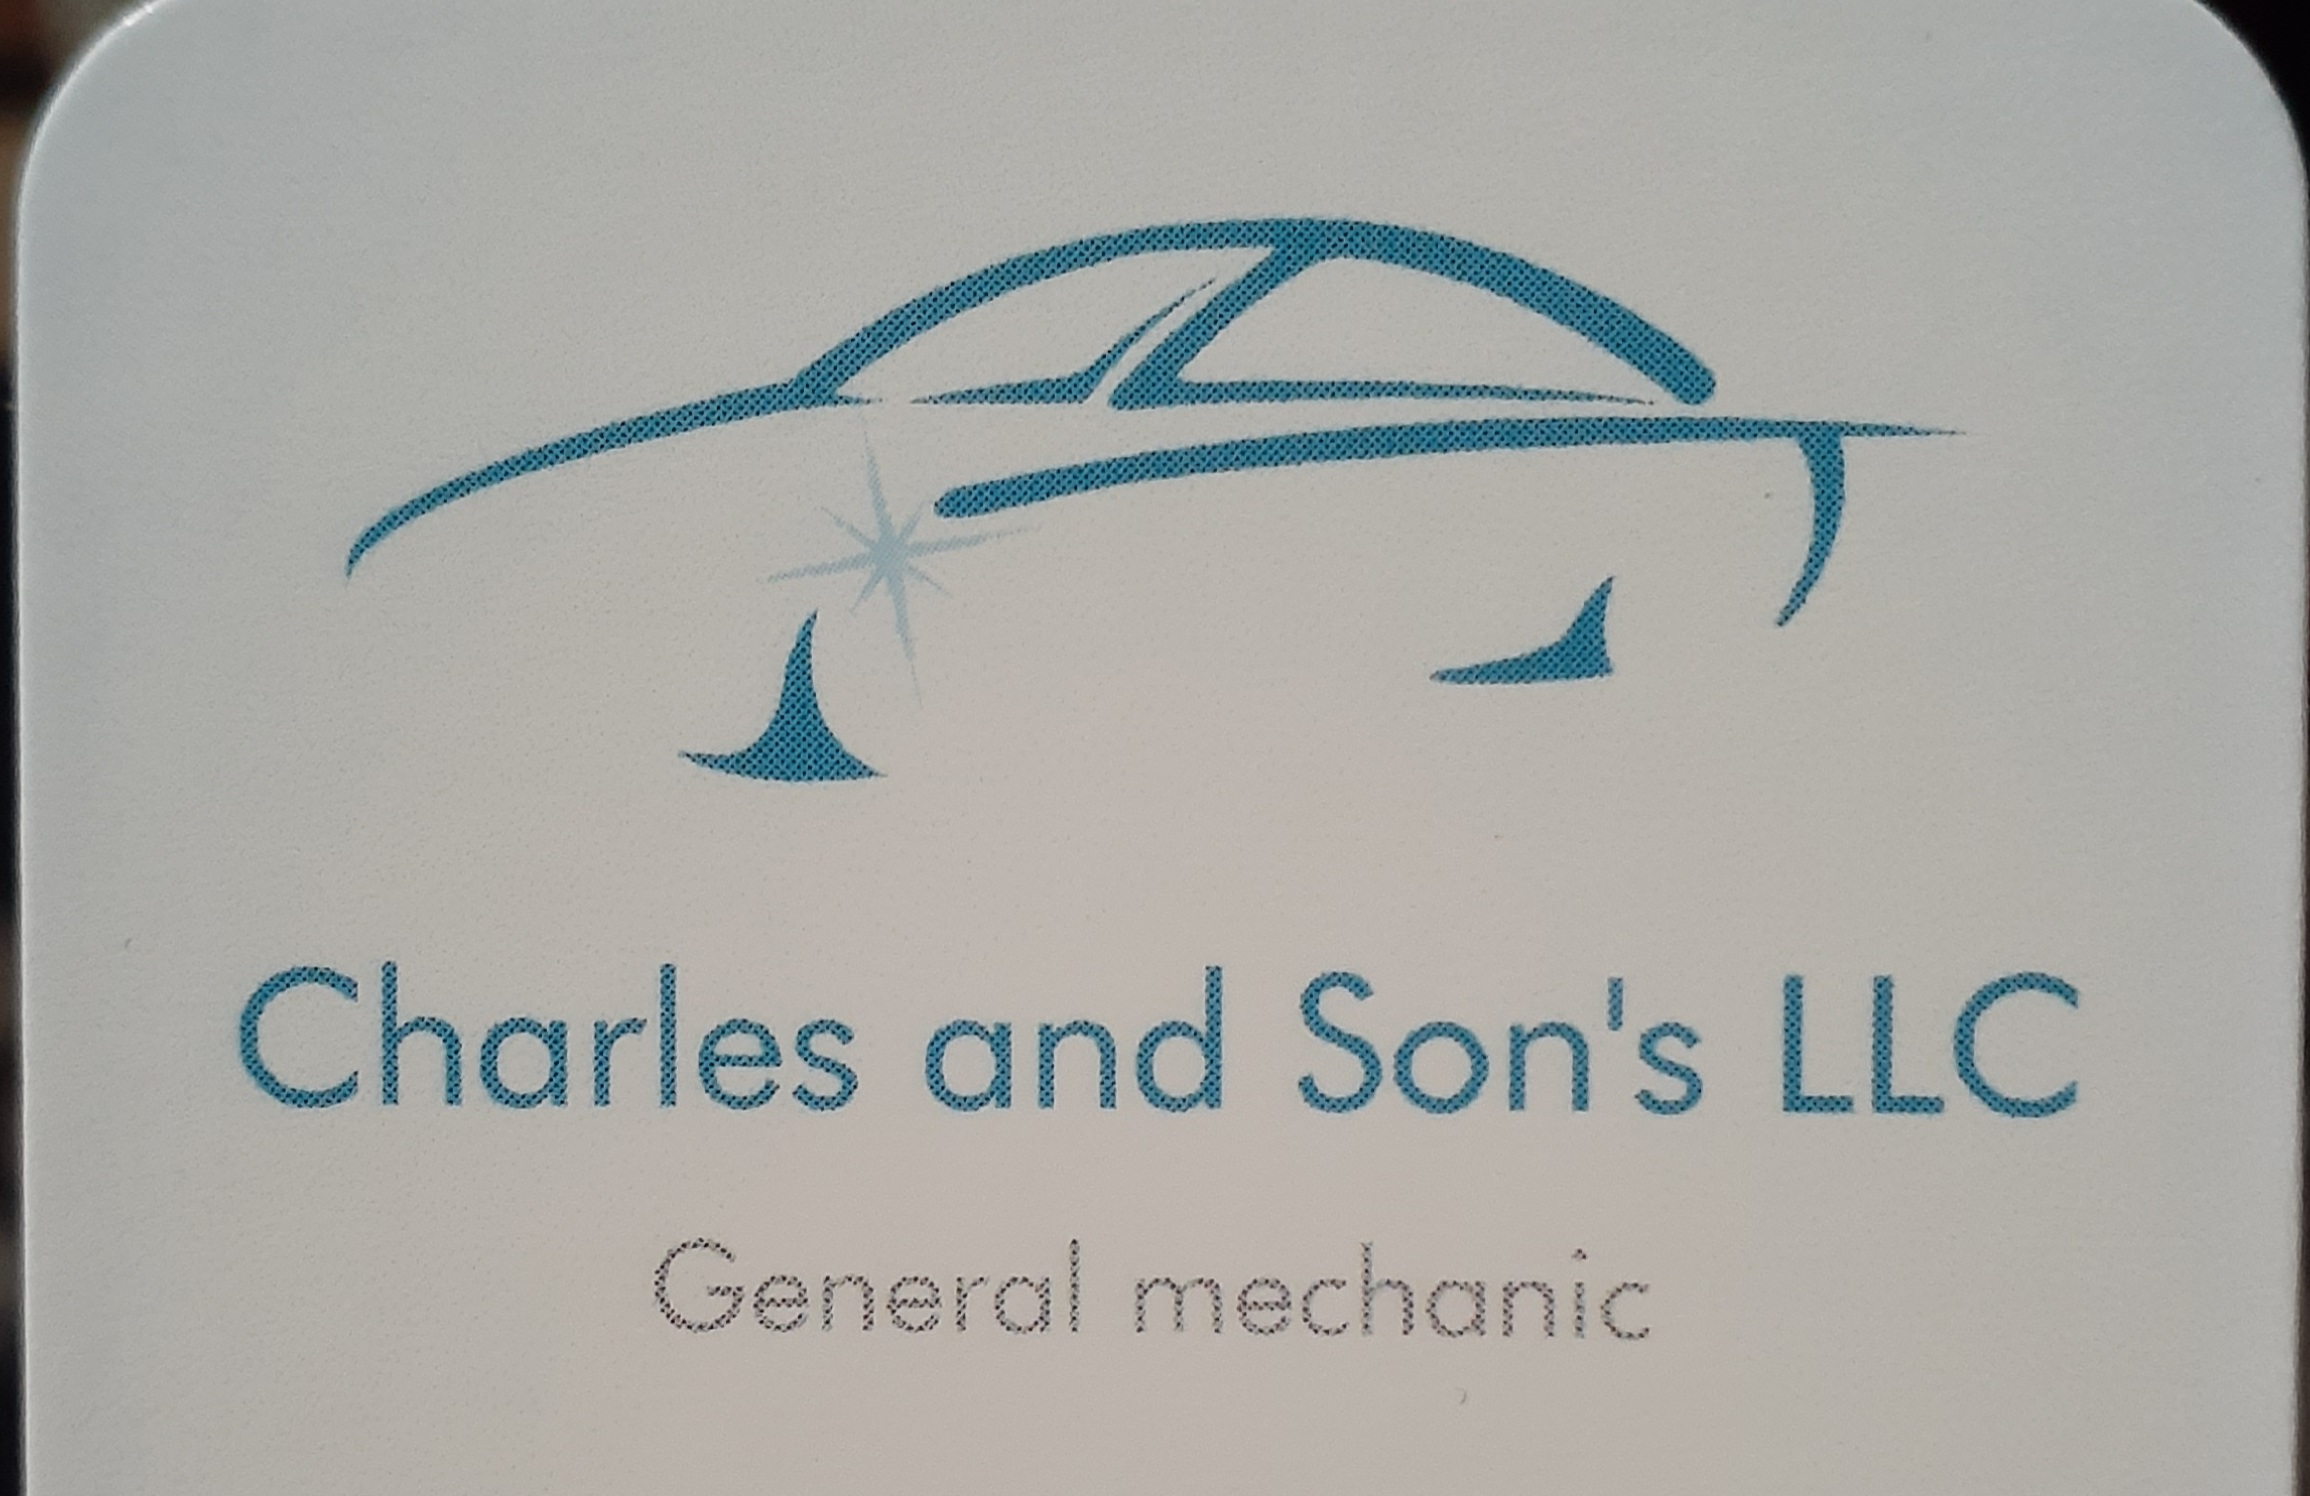 Charles and Son's mobile mechanic LLC